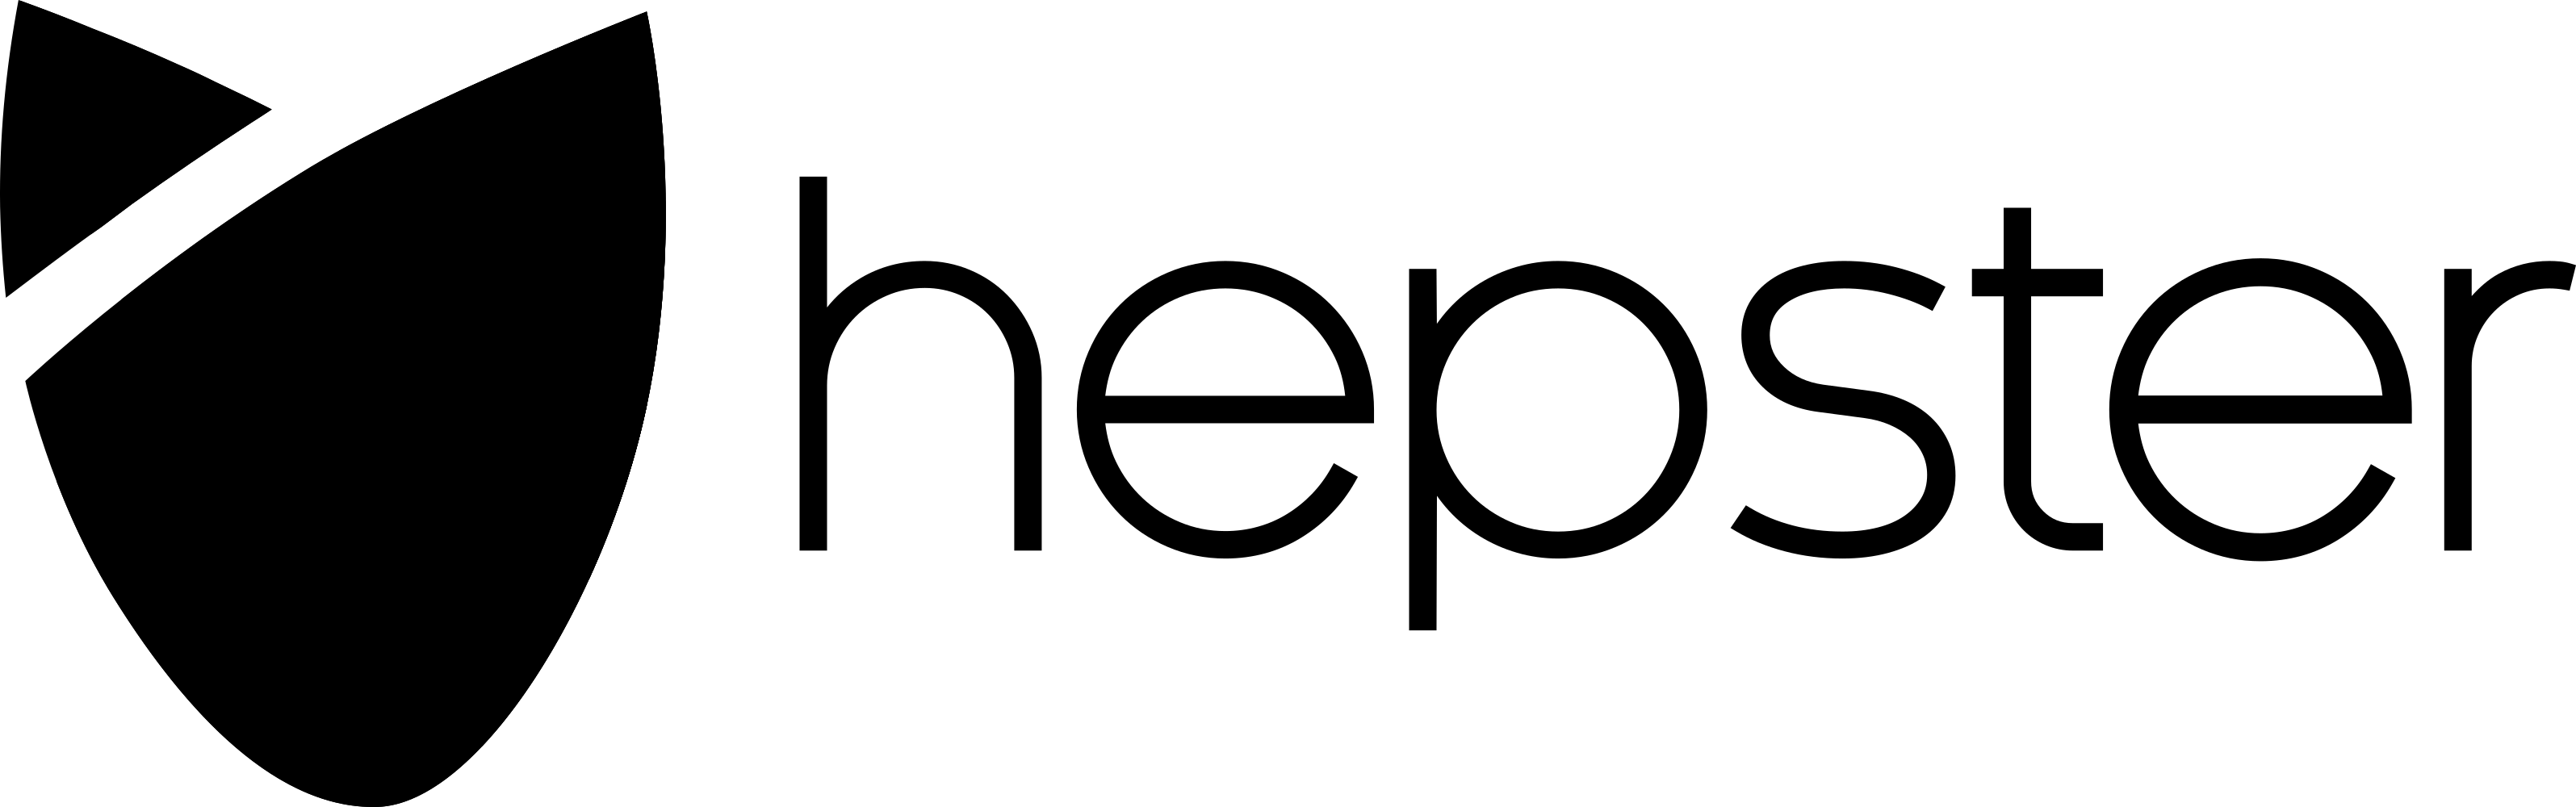 Logo hepster schwarz